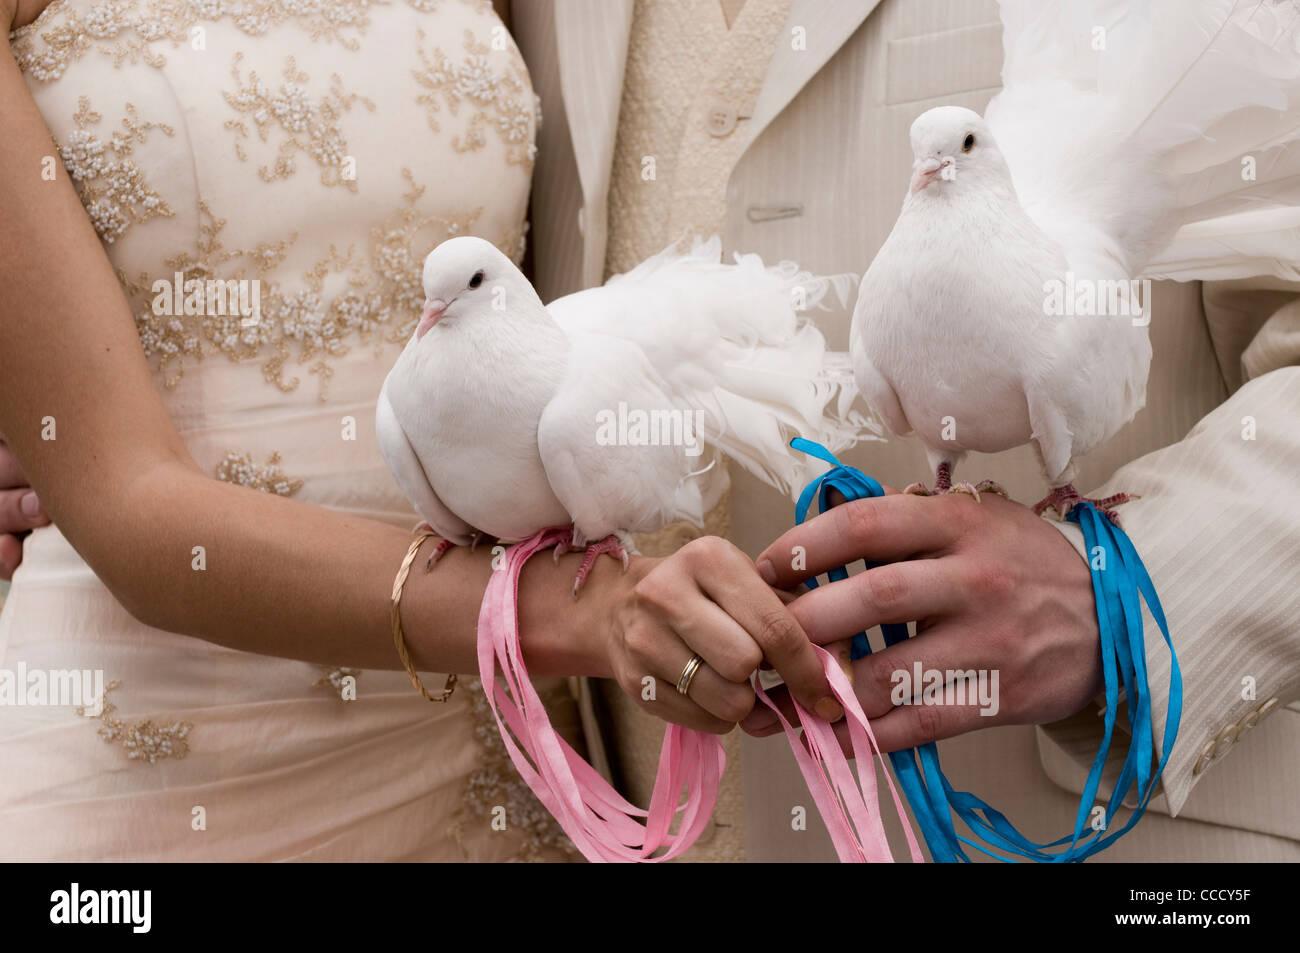 Two White Doves Love Birds Stock Photos Two White Doves Love Birds